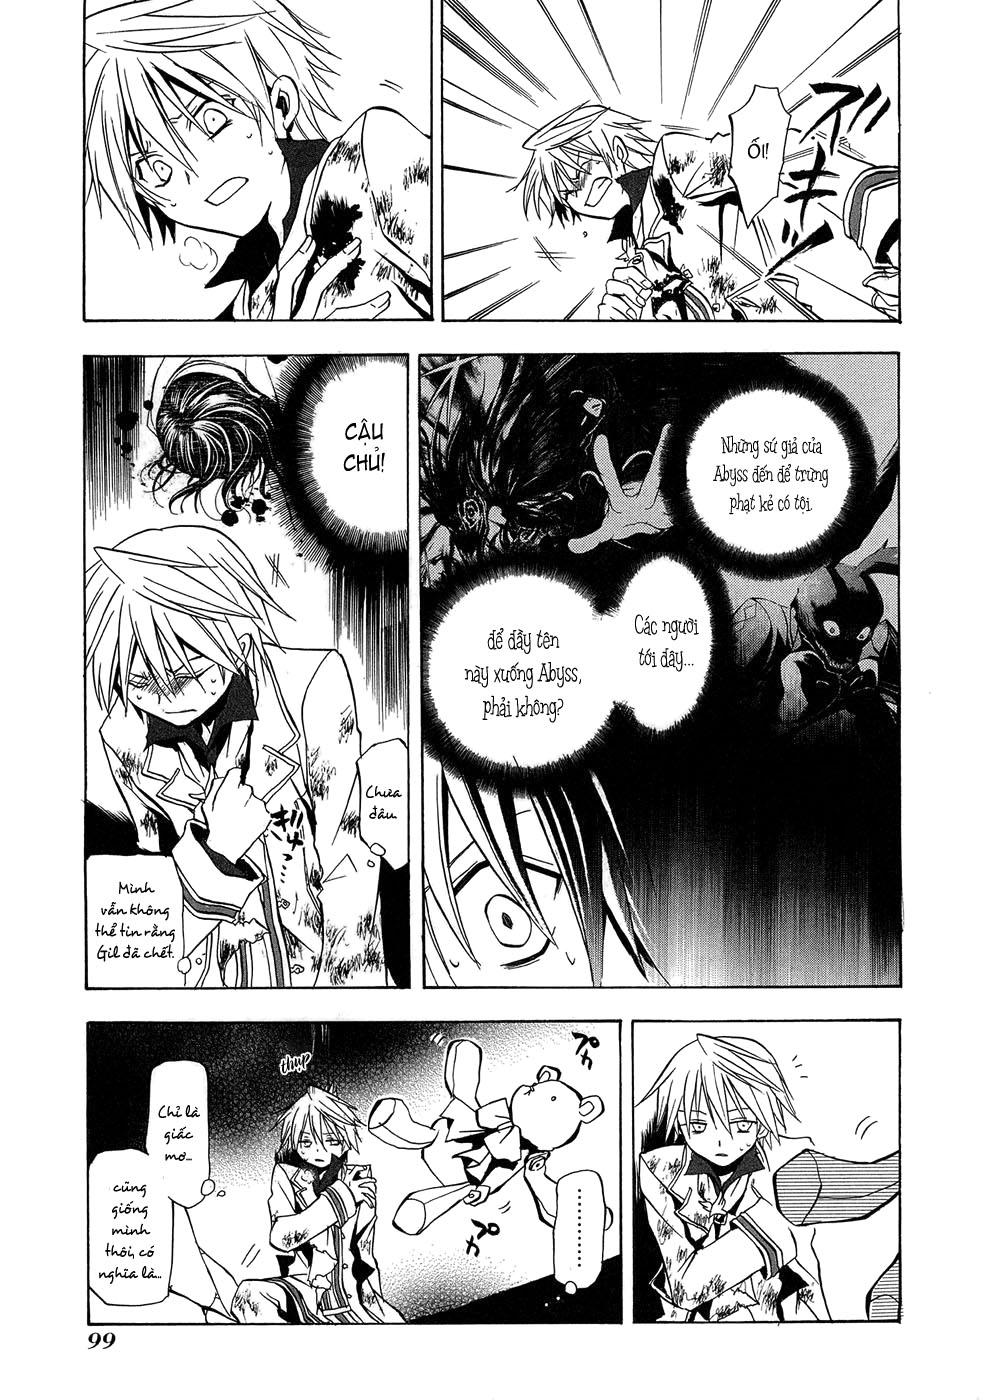 Pandora Hearts chương 003 - retrace: iii prisoner & alichino trang 6